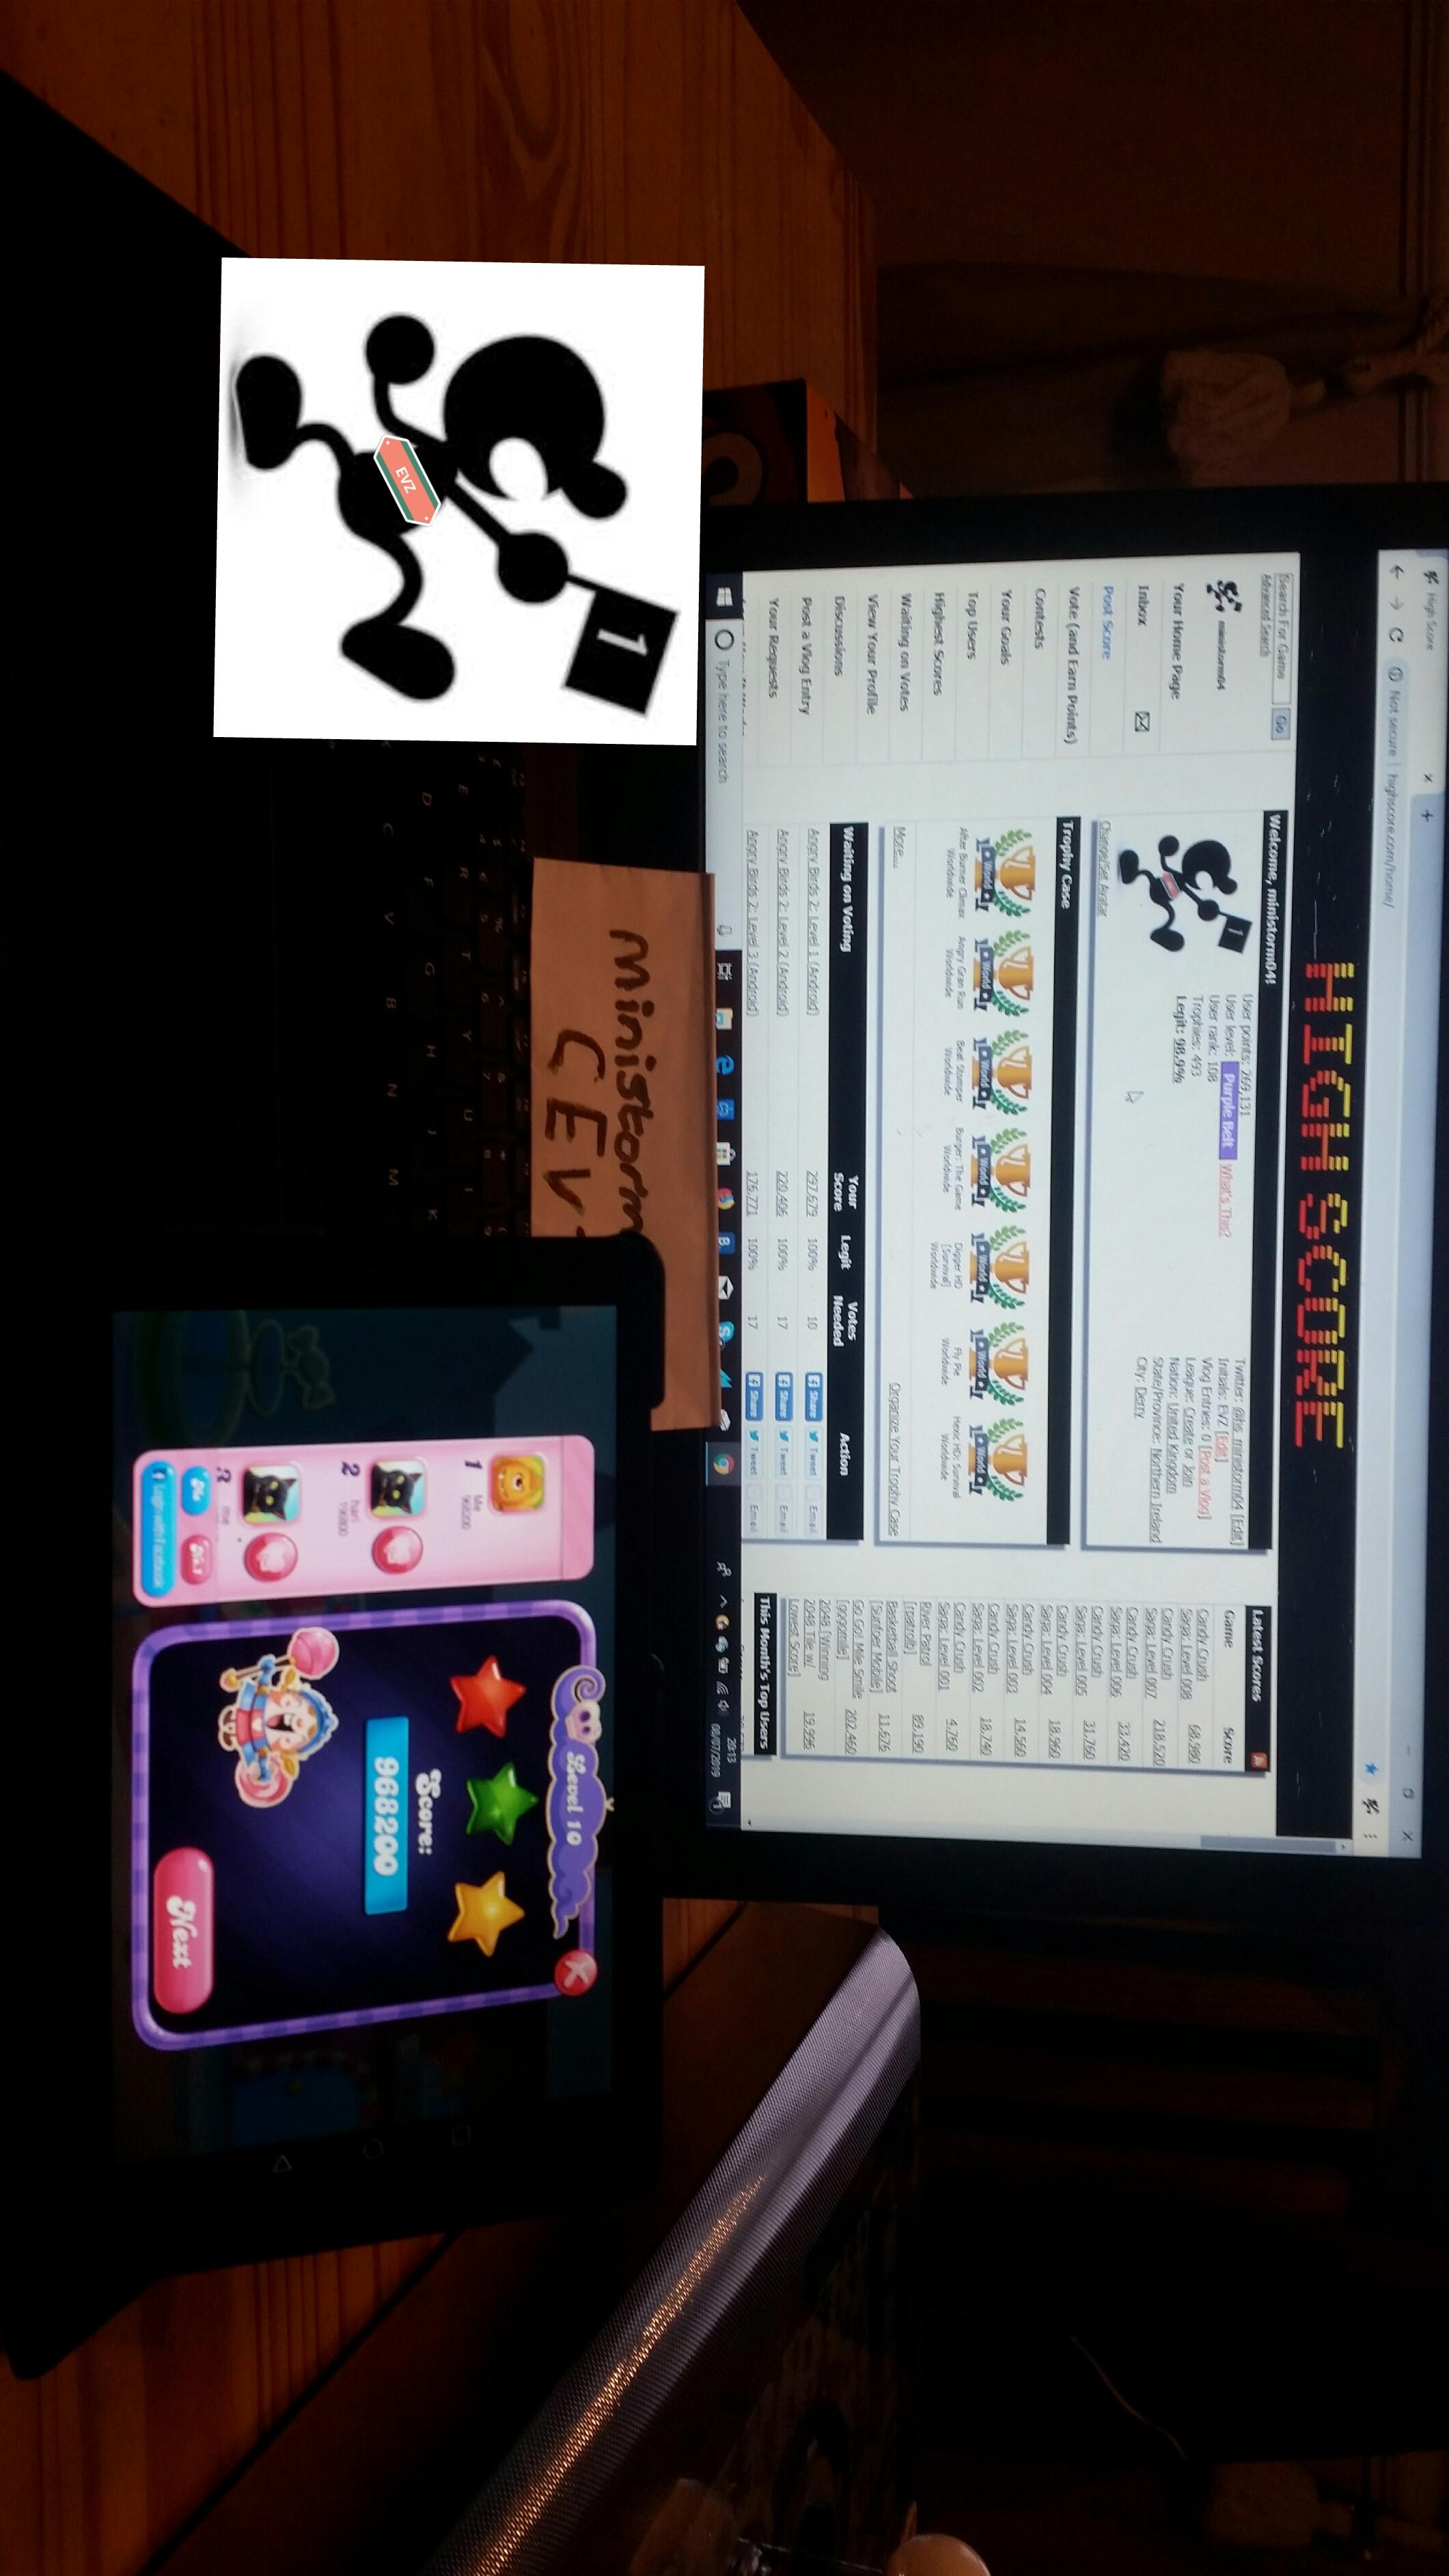 Candy Crush Saga: Level 010 968,200 points